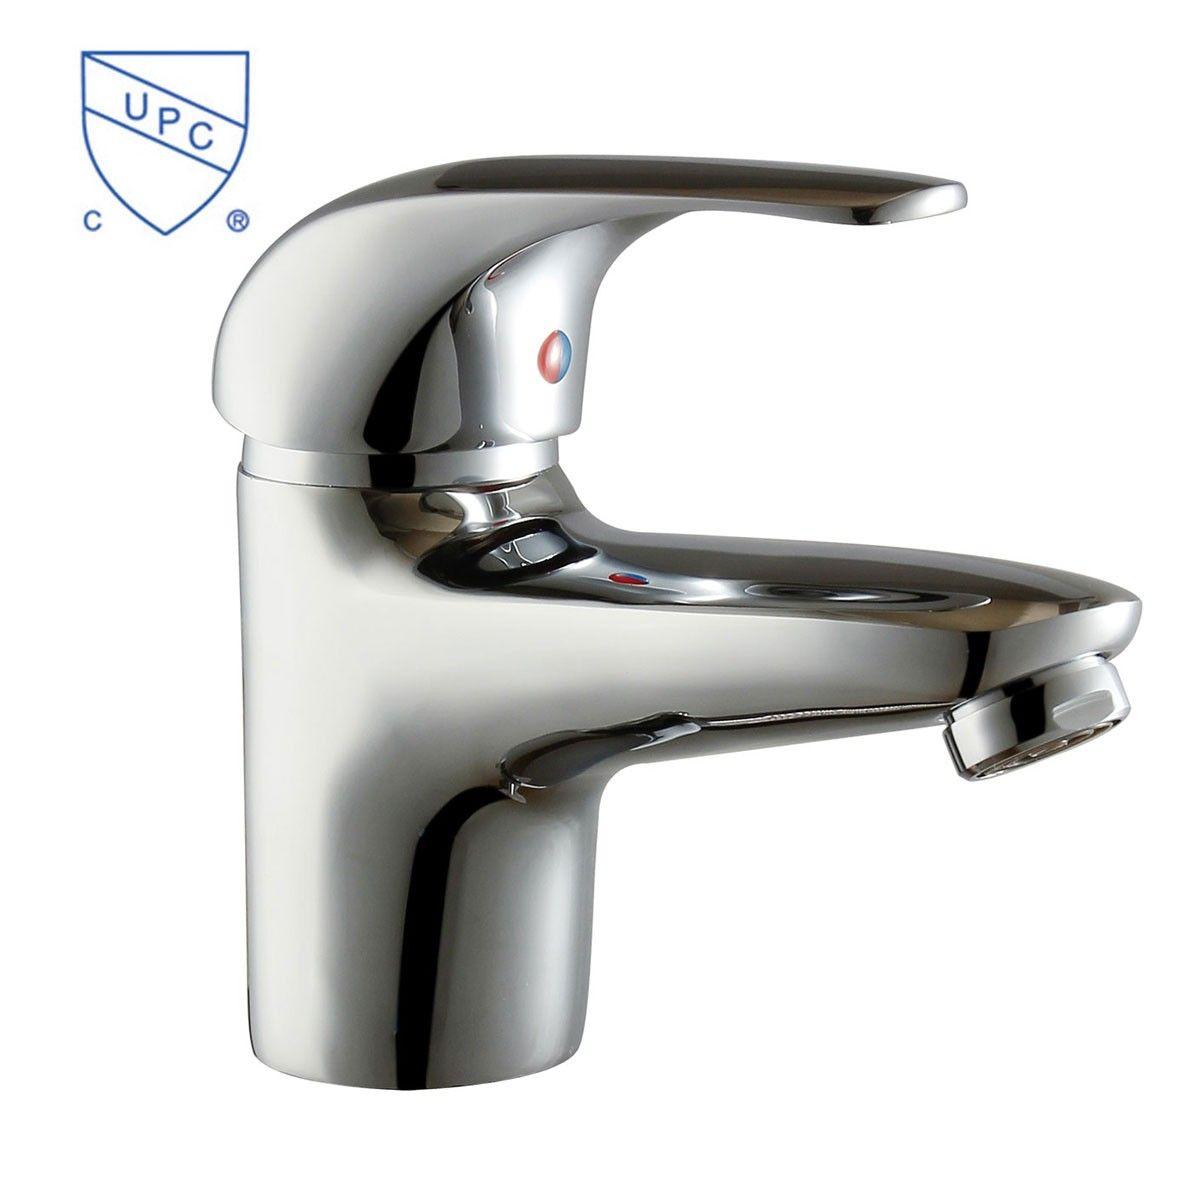 Basin Sink Faucet Single Hole Single Lever Brass With Chrome Finish 3027 Decoraport Canada